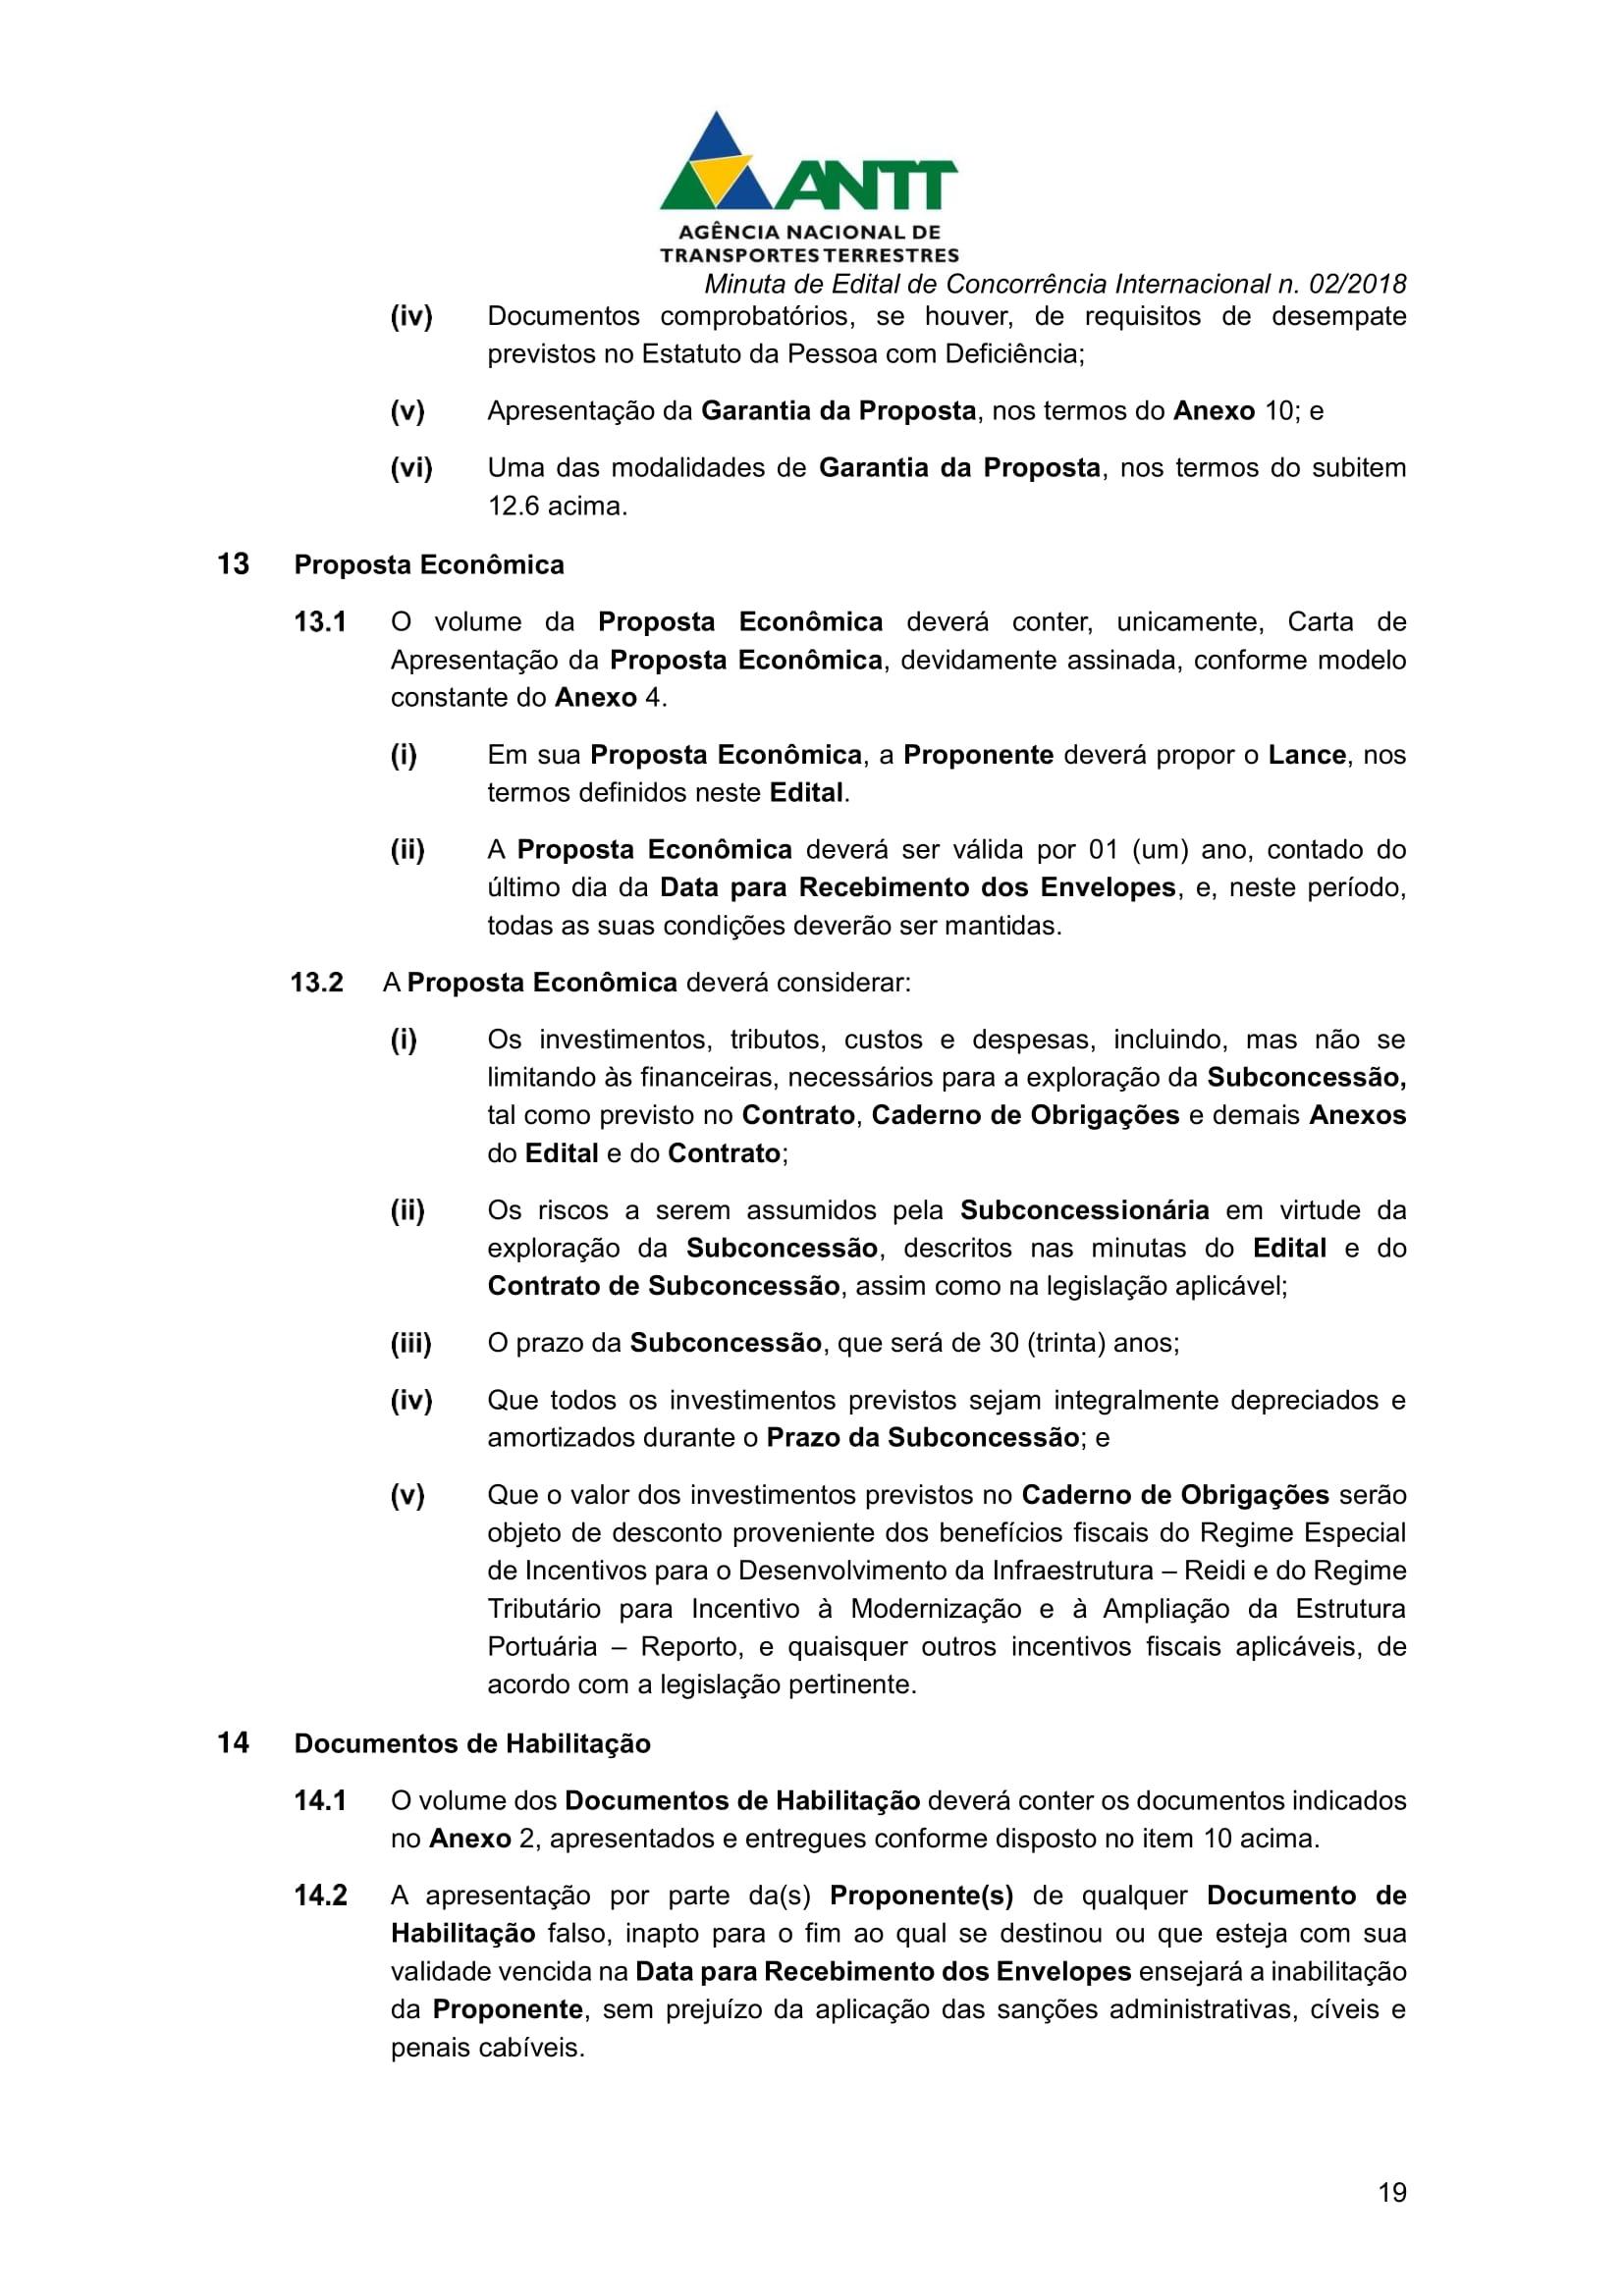 minuta_de_edital_-_porto_nacional-estrela_doeste-19